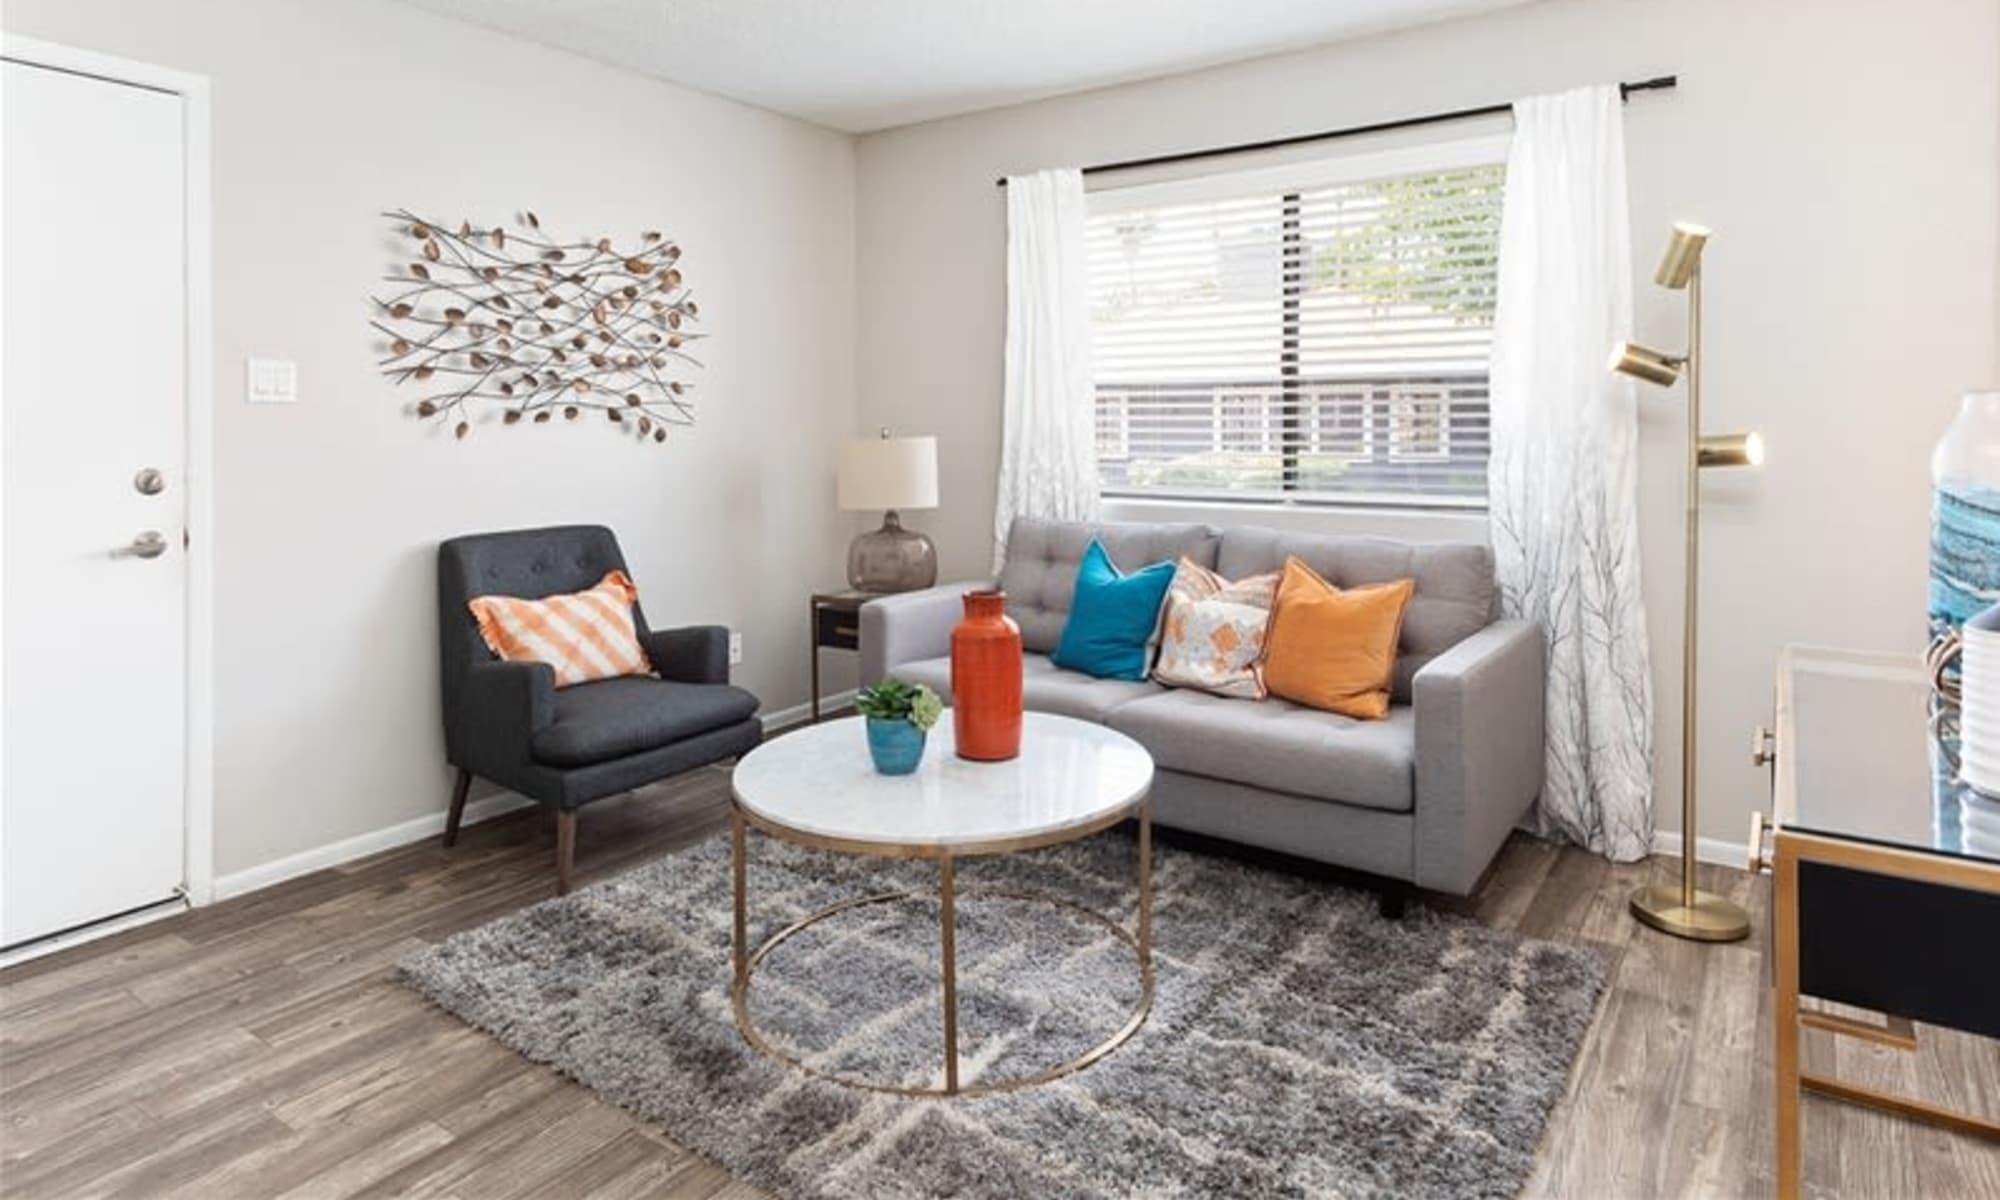 Apartments for rent at Argenta Apartments in Mesa, Arizona